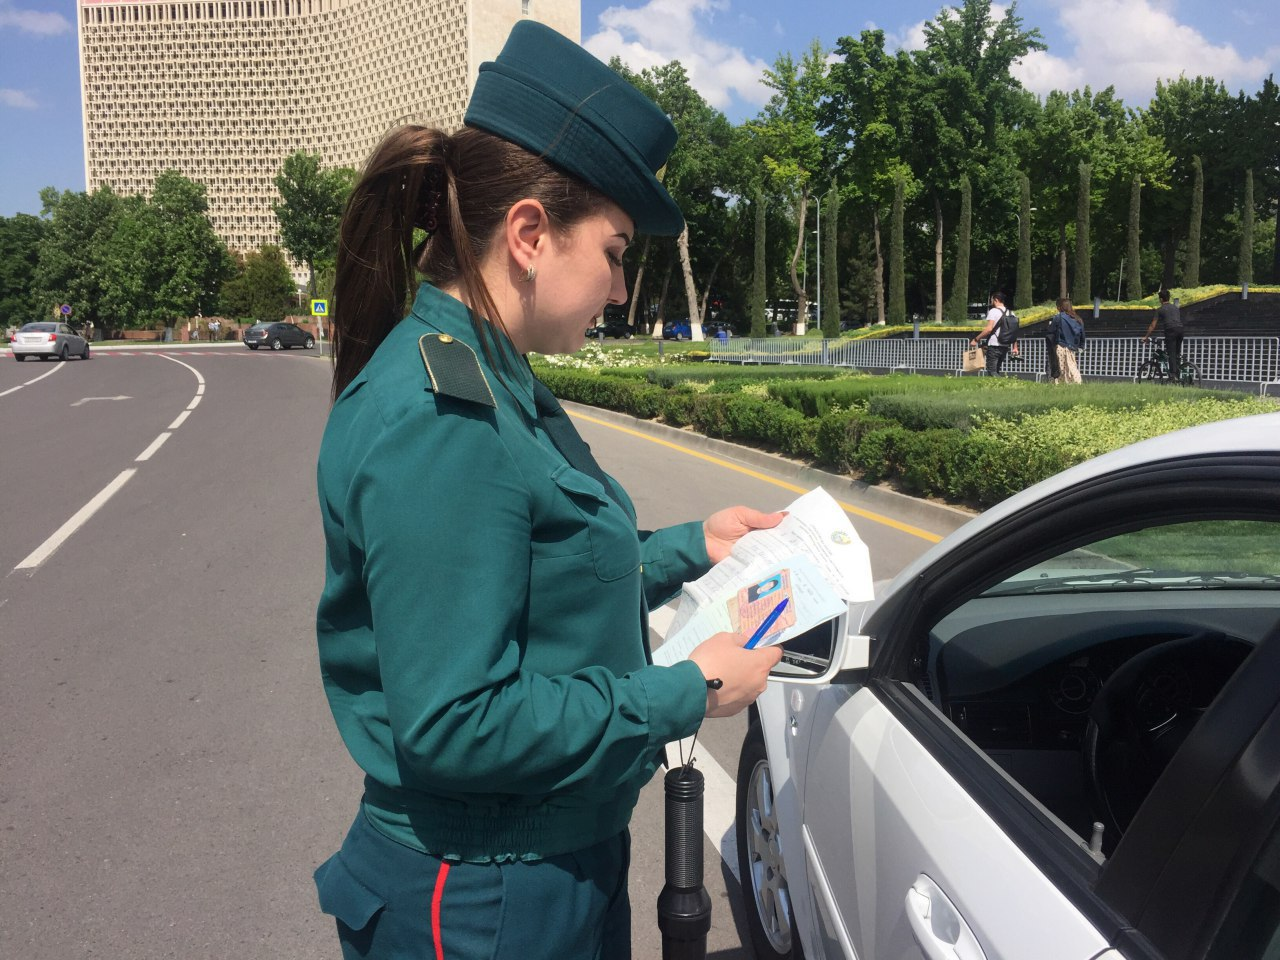 работа для девушки в узбекистане